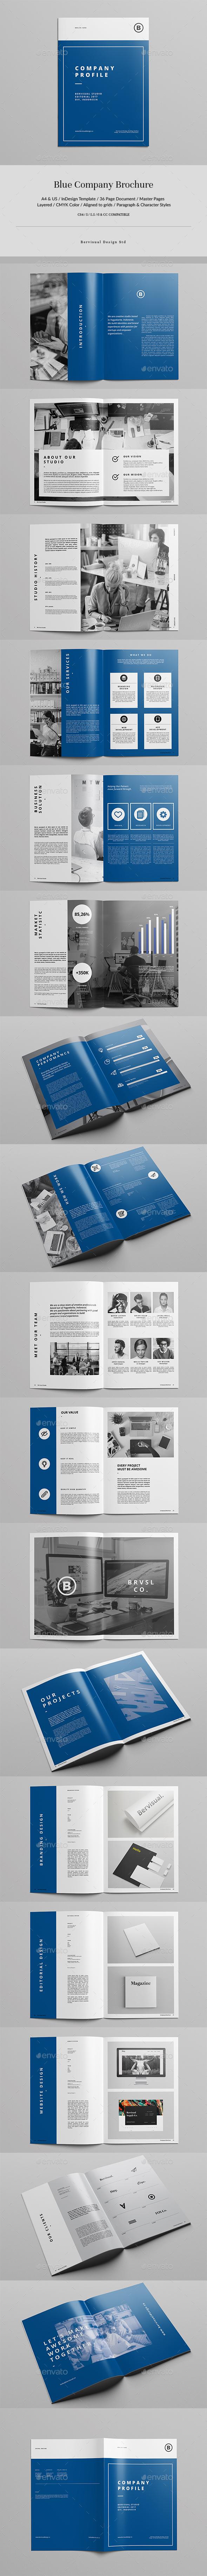 Blue Company Brochure - Corporate Brochures